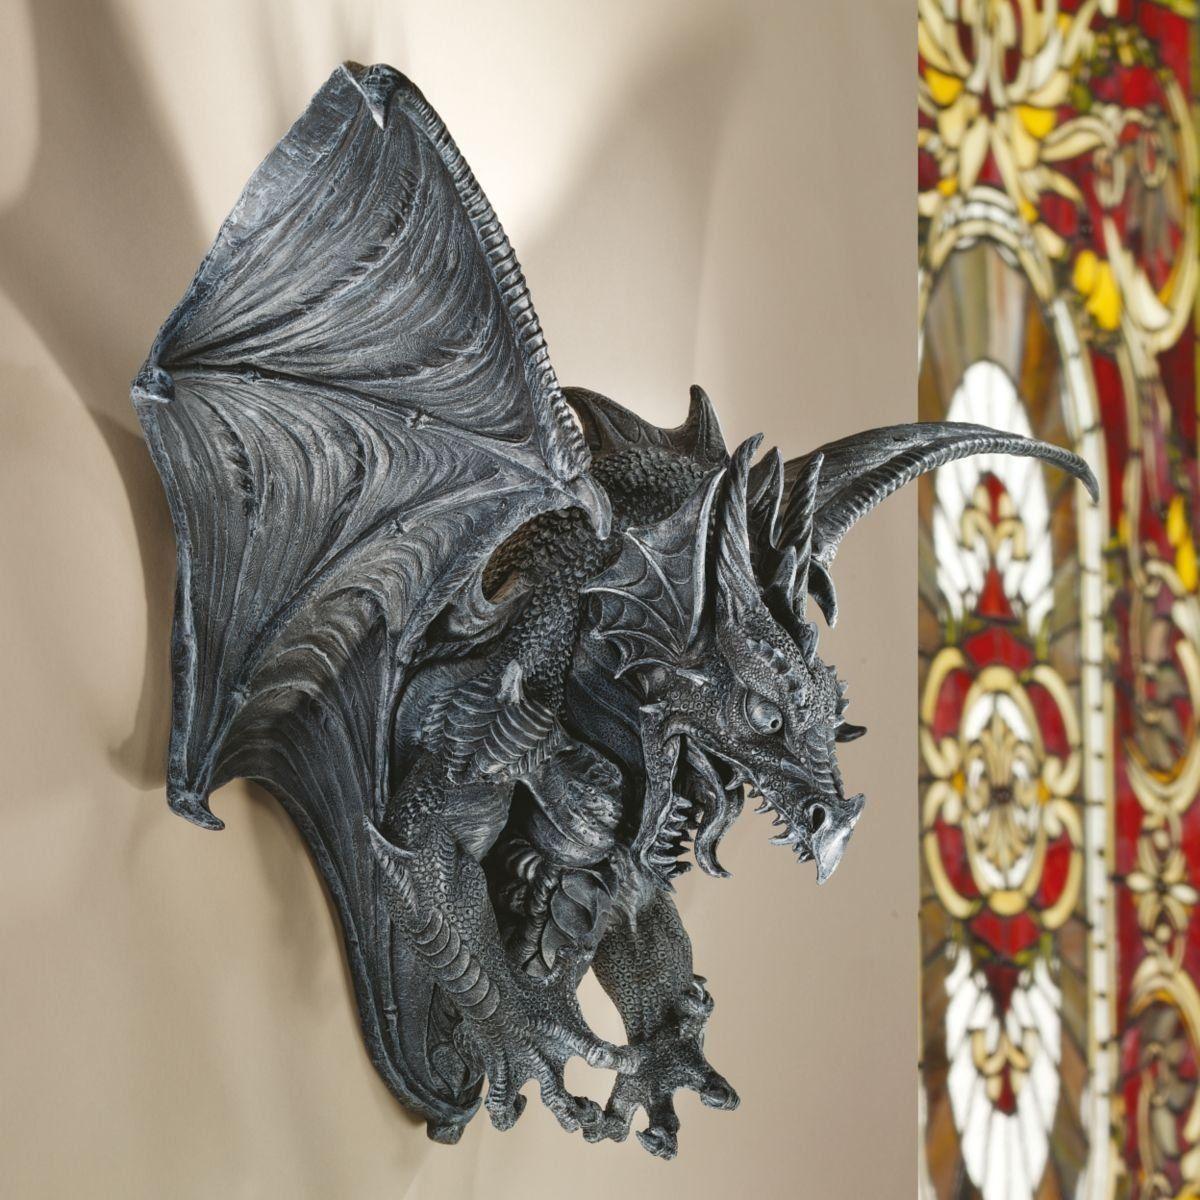 Pinterest Halloween Wall Decor : Xoticbrands quot gothic dragon bat wall sculpture statue